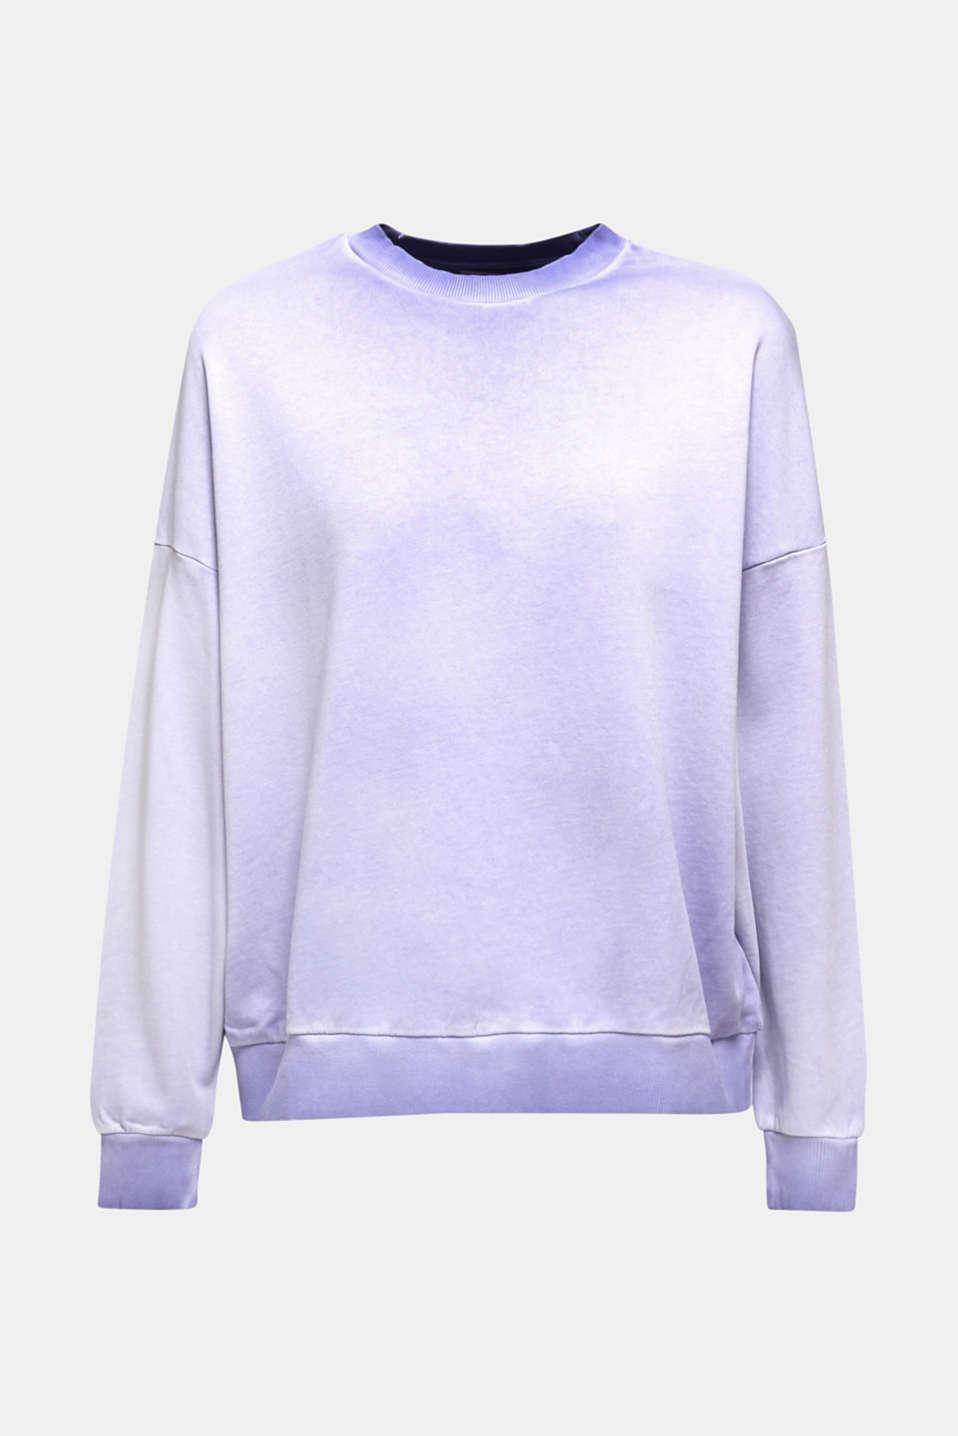 Sweatshirt with batwing sleeves, 100% cotton, DARK LAVENDER, detail image number 8